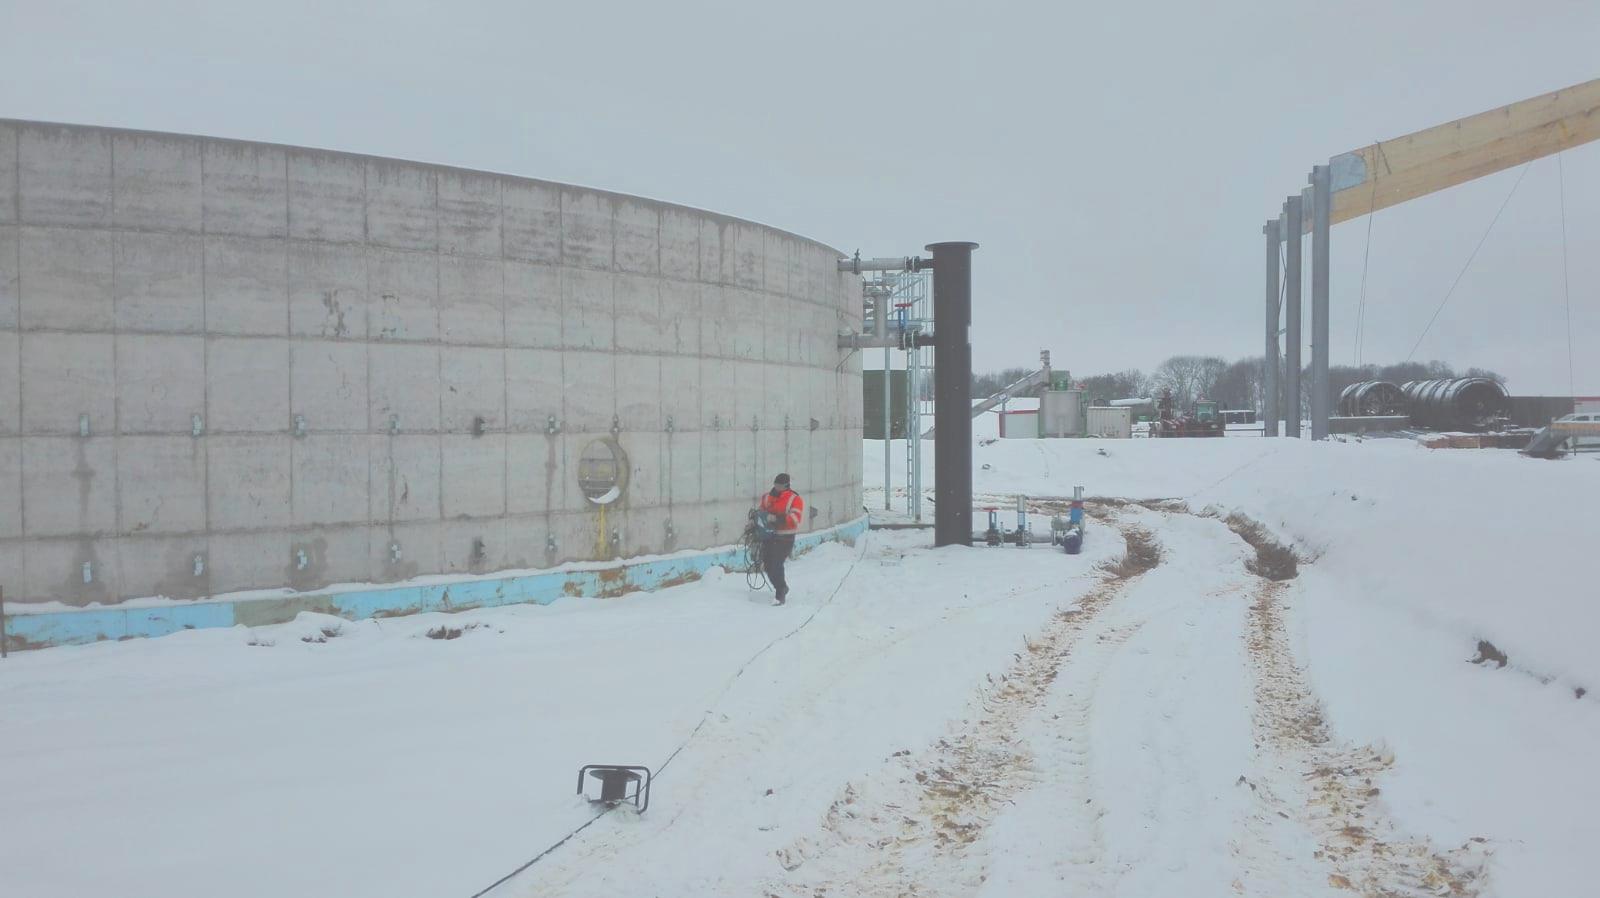 Mahé Biogas Boutigny France Planta biogas-Mahe Boutigny Francia-Envitec 02